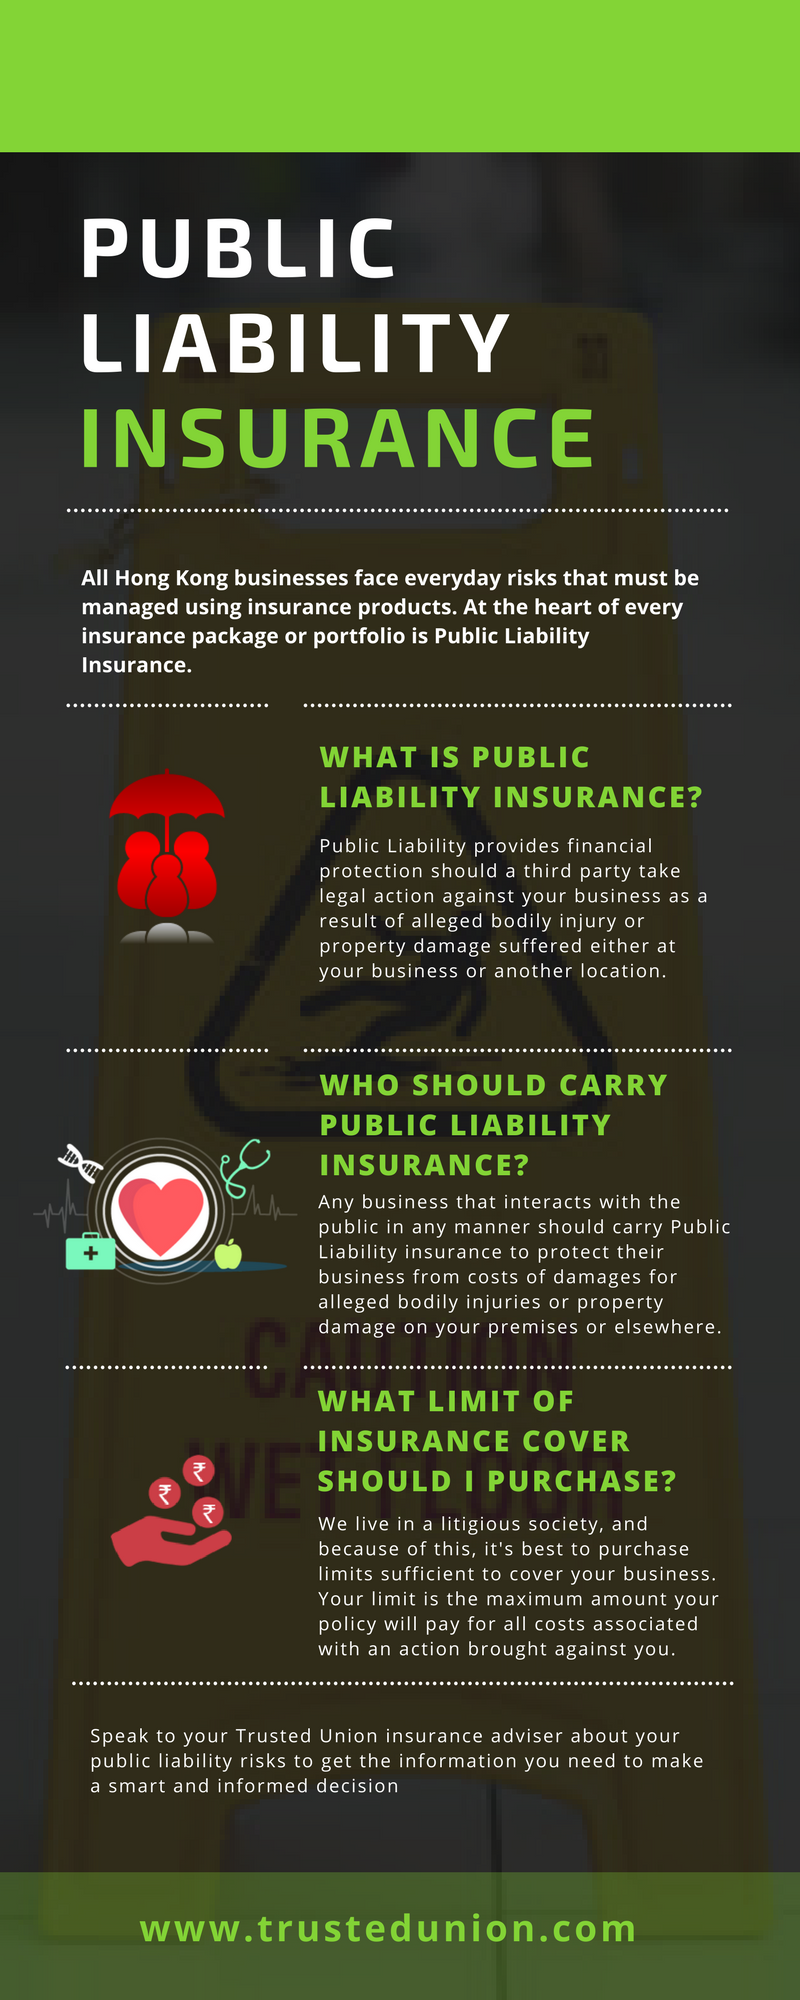 Public Liability Insurance Hong Kong Liability Liability Insurance Insurance